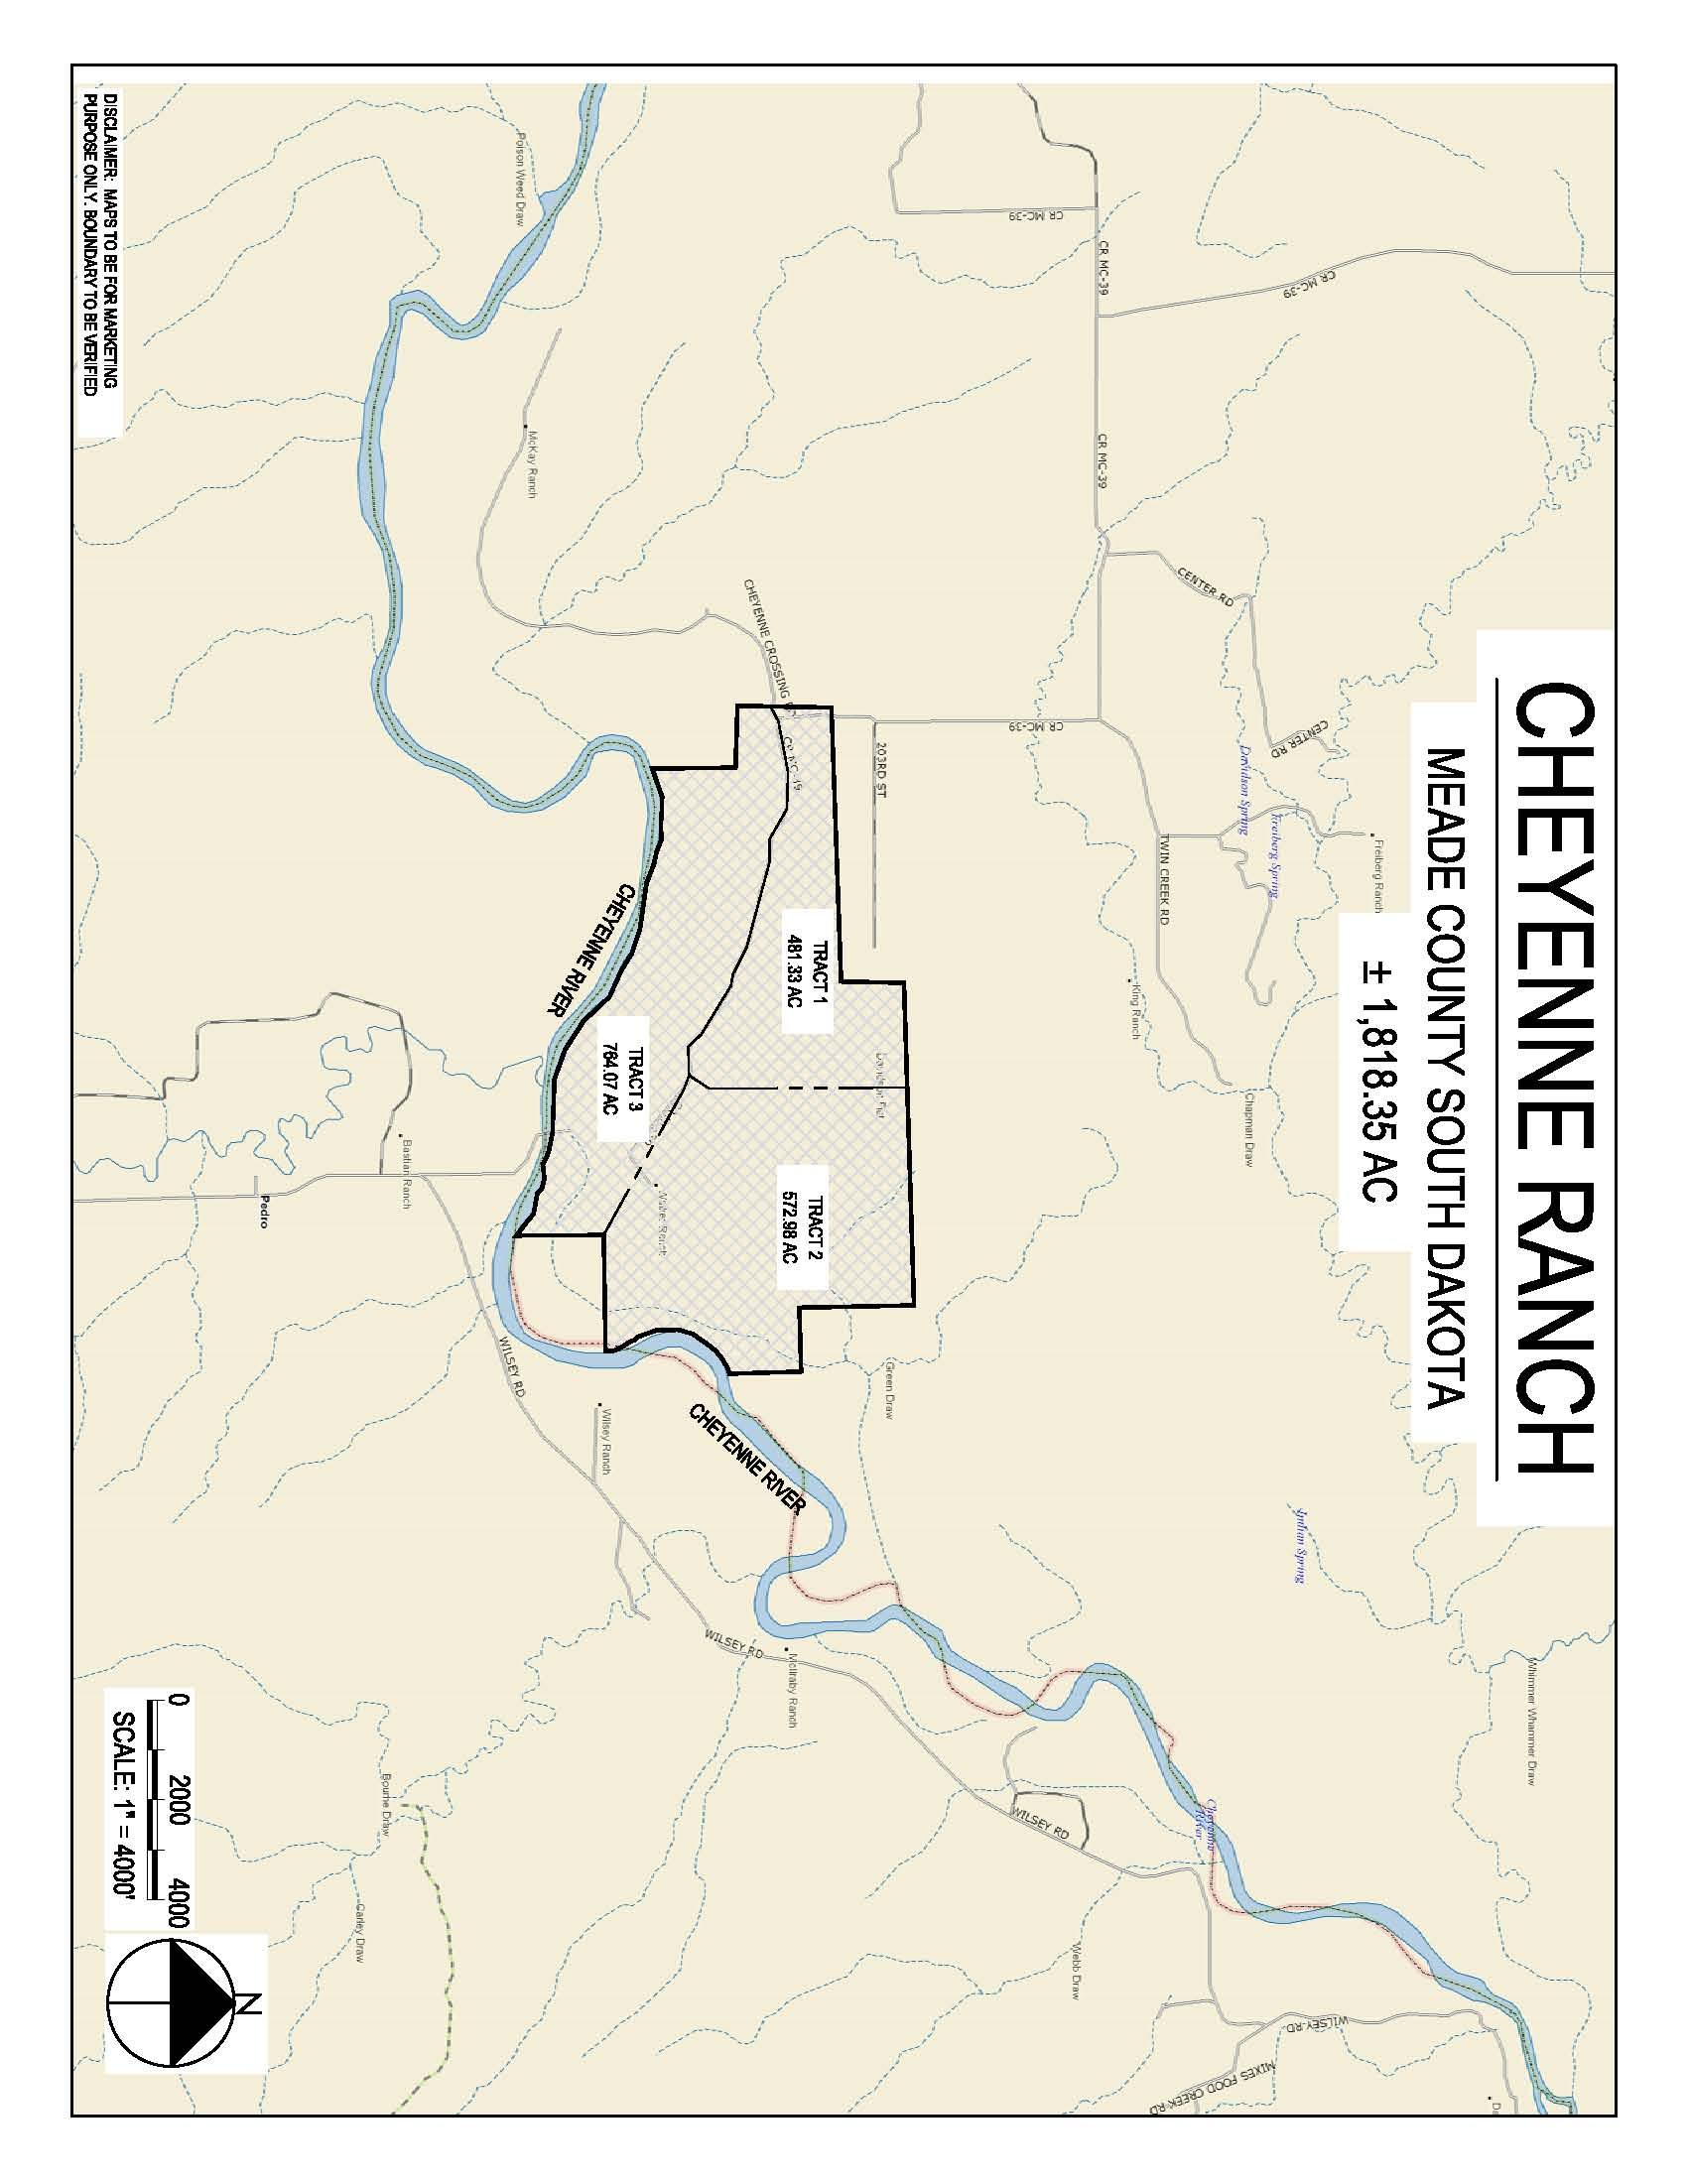 South dakota meade county howes - Resources